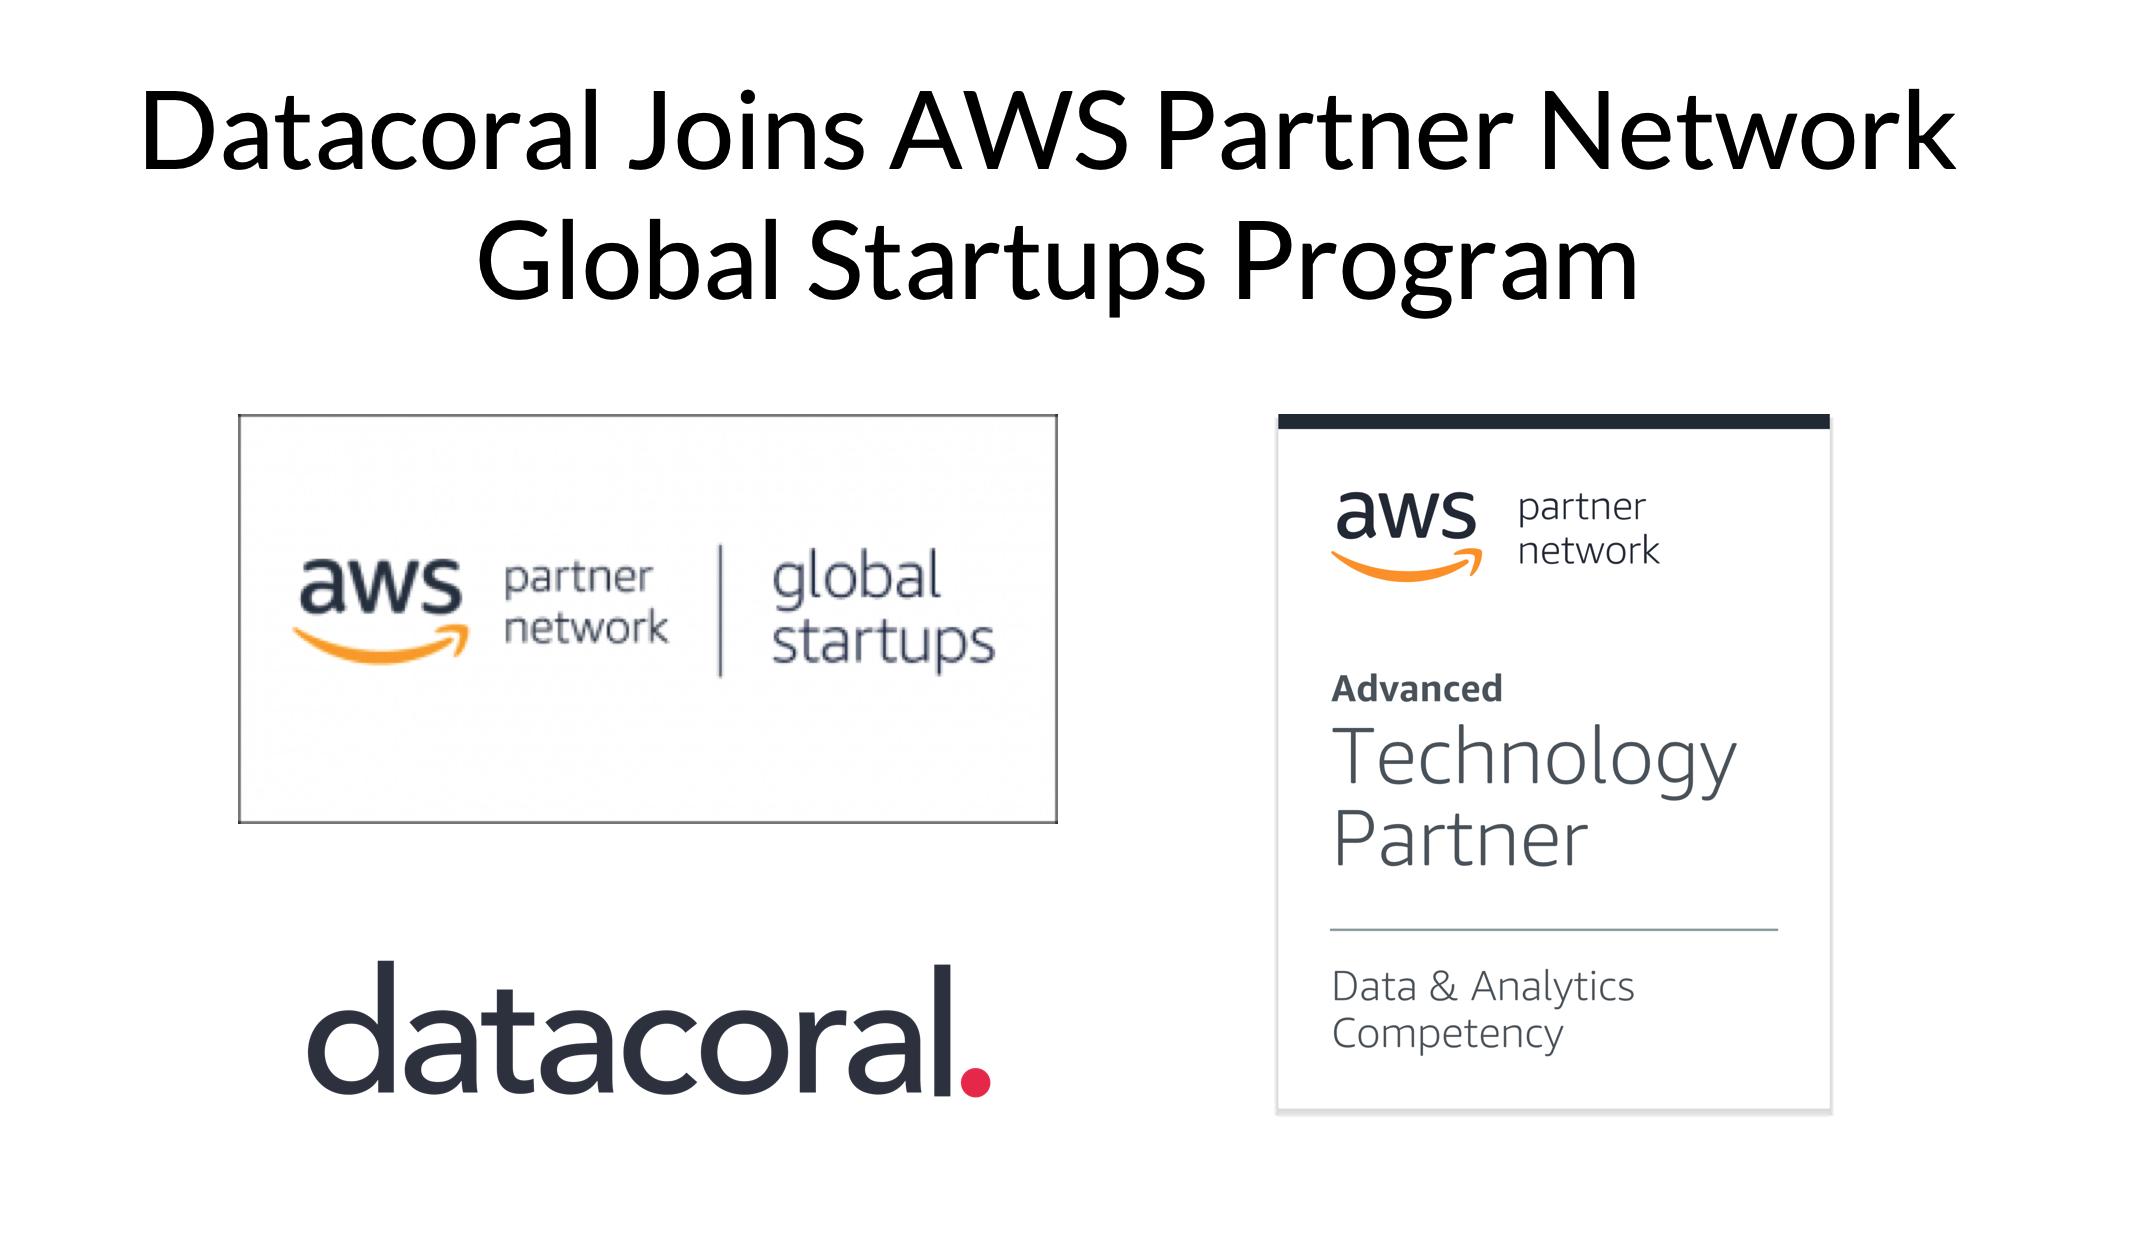 Datacoral joins AWS Partner Network Global Startups Program